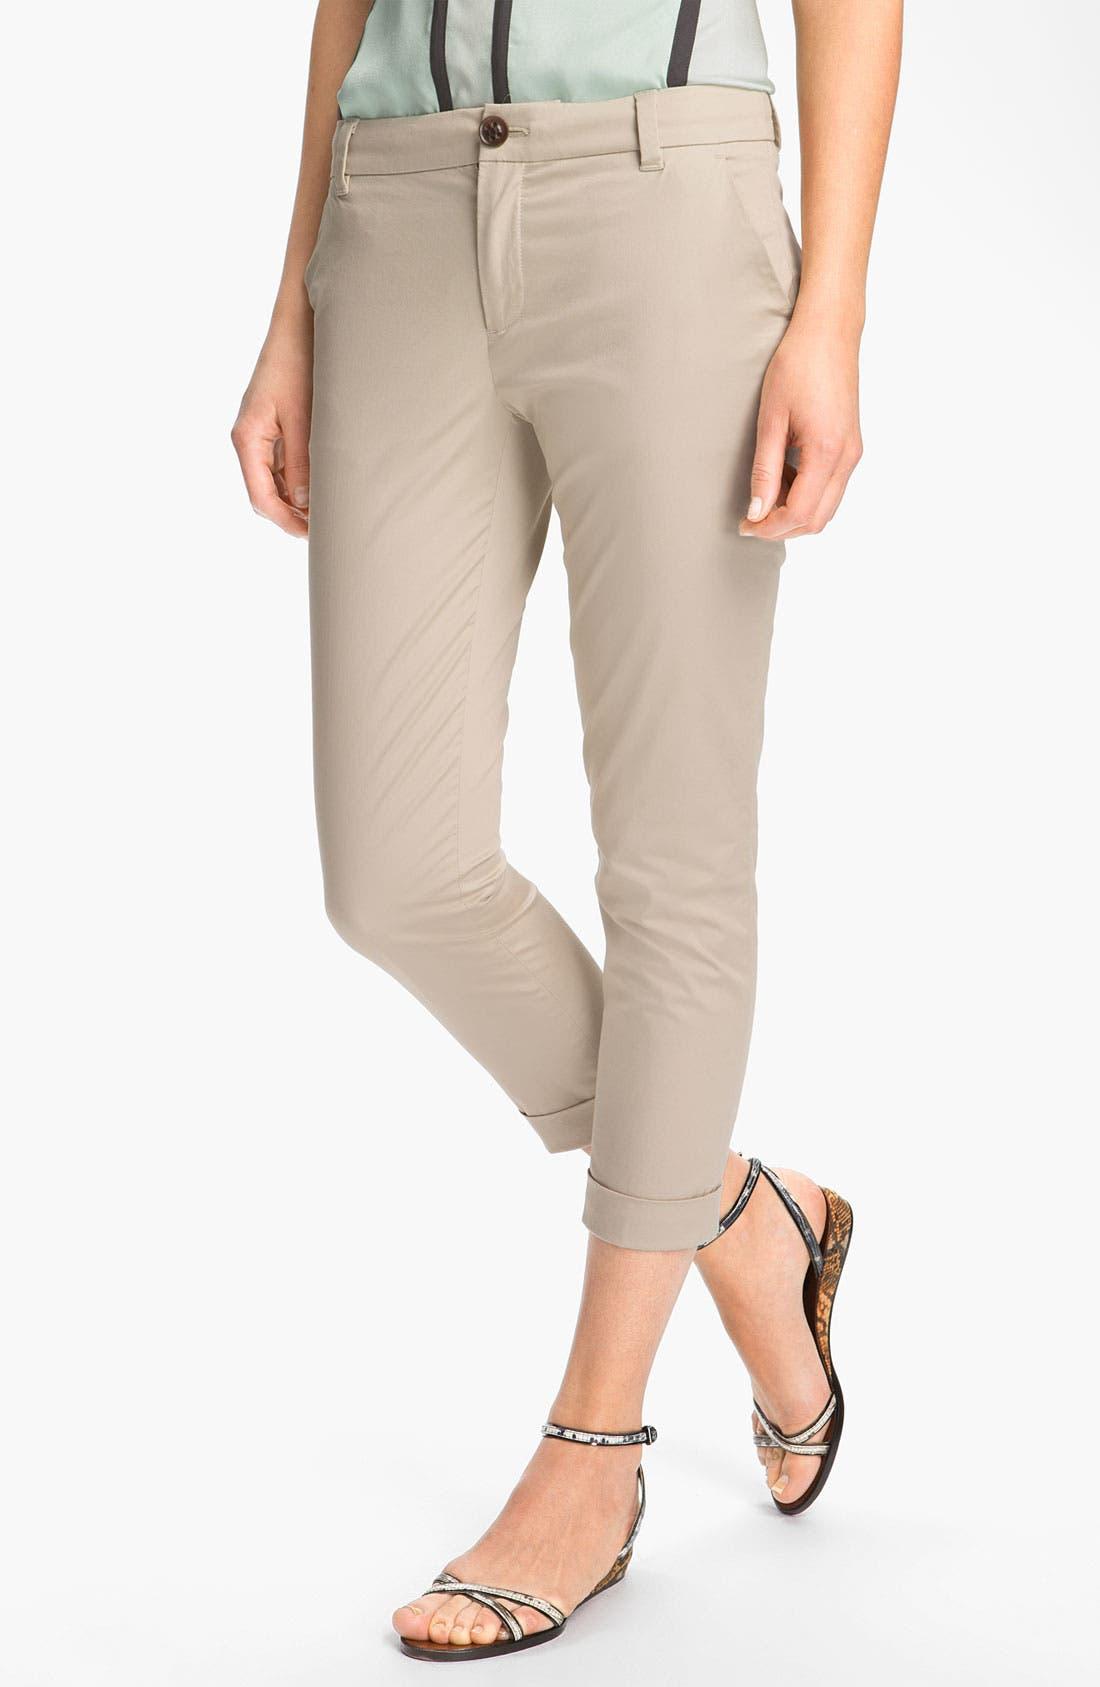 Alternate Image 1 Selected - J Brand Ready-to-Wear 'Patti' Chino Pants